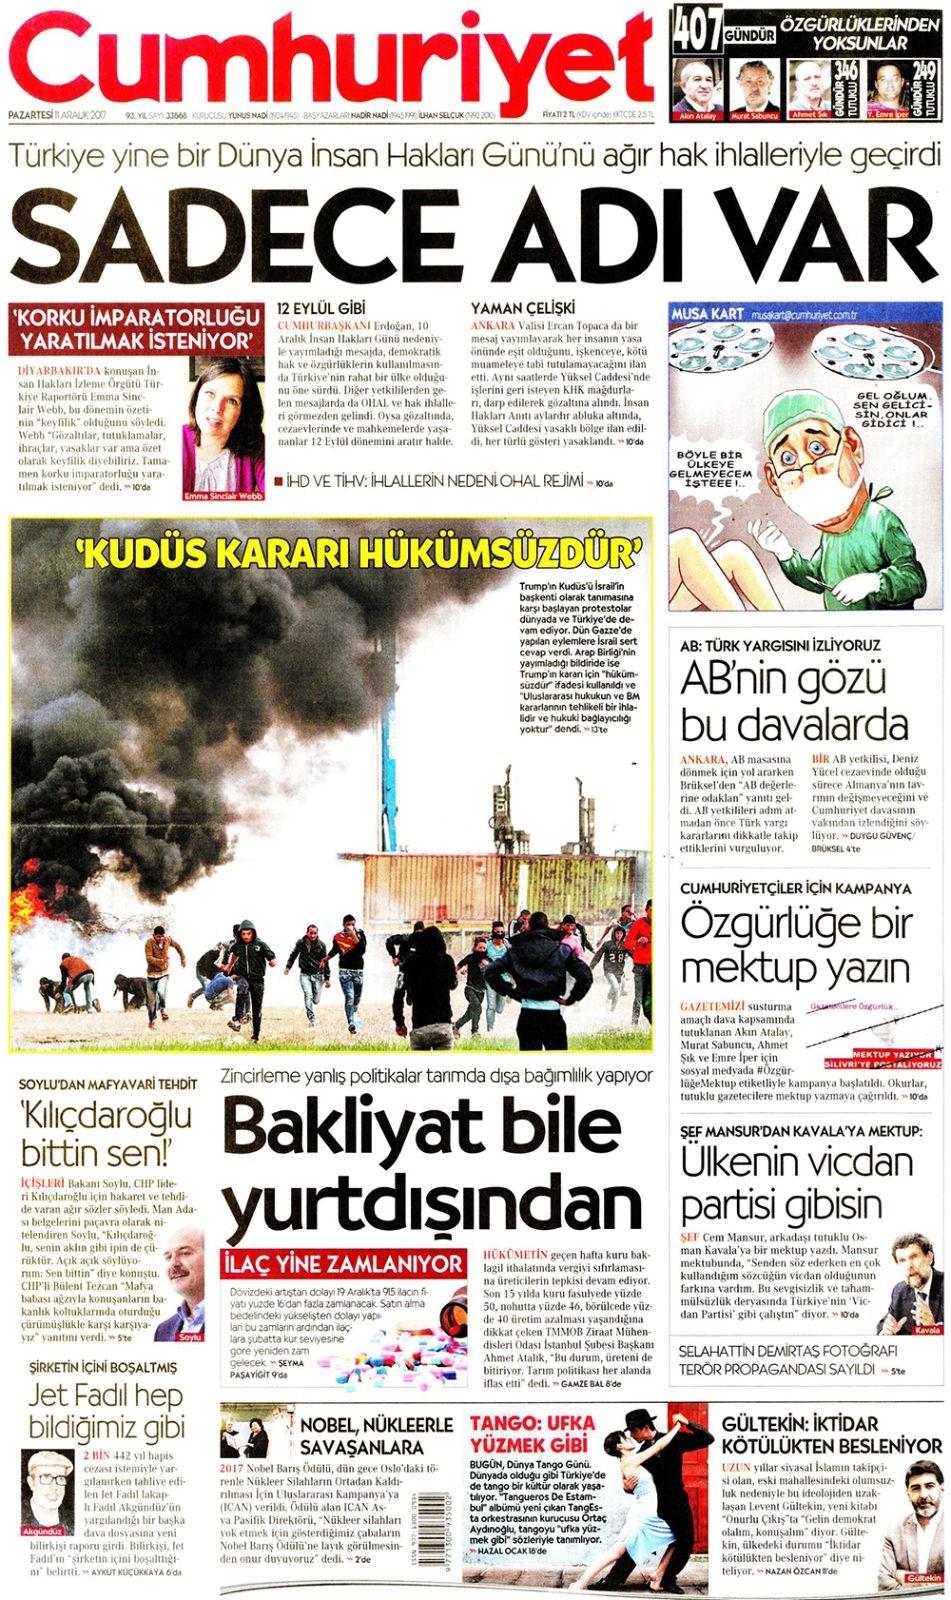 Gazeteler  Gazete  Gazete Oku  Gazete Manşetleri